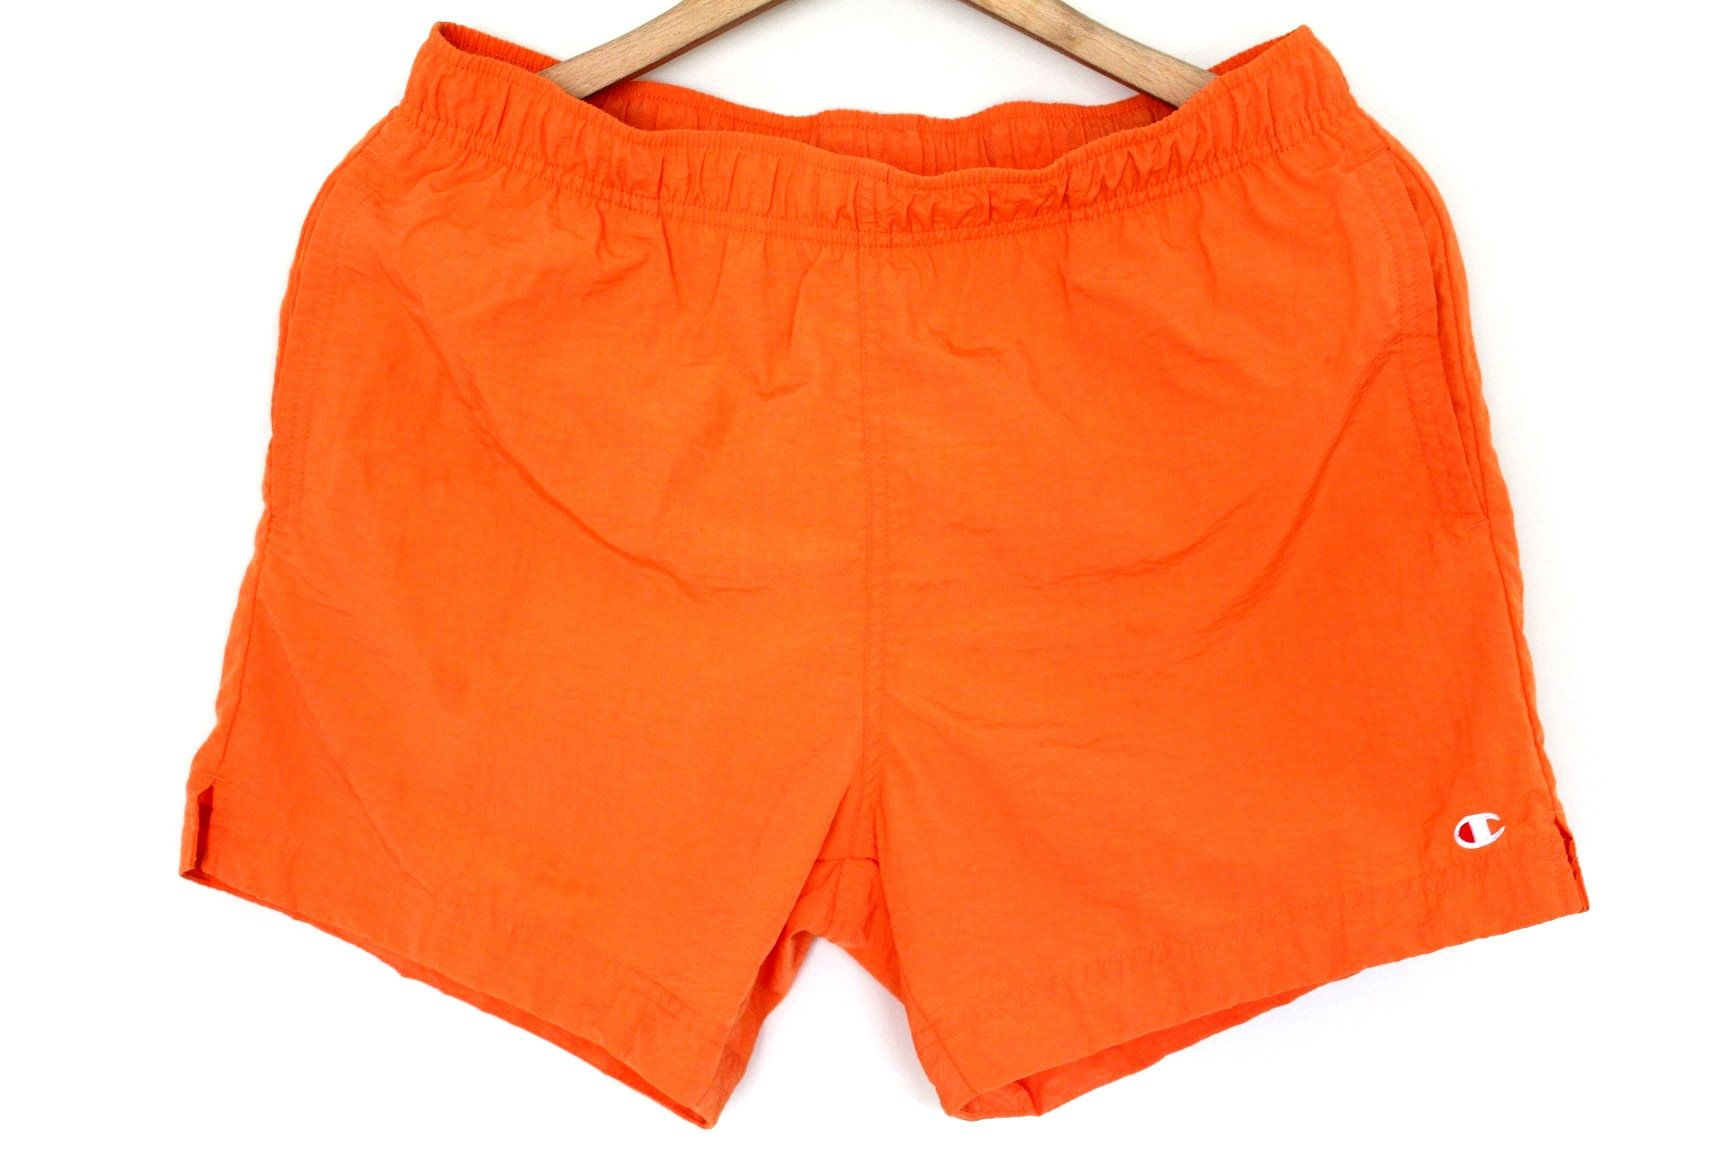 90 S Champion Shorts Vintage Champion Sport Shorts Orange Champion Pants Champion Beach Swimming Running Sho Vintage Champion Running Shorts Champion Sports